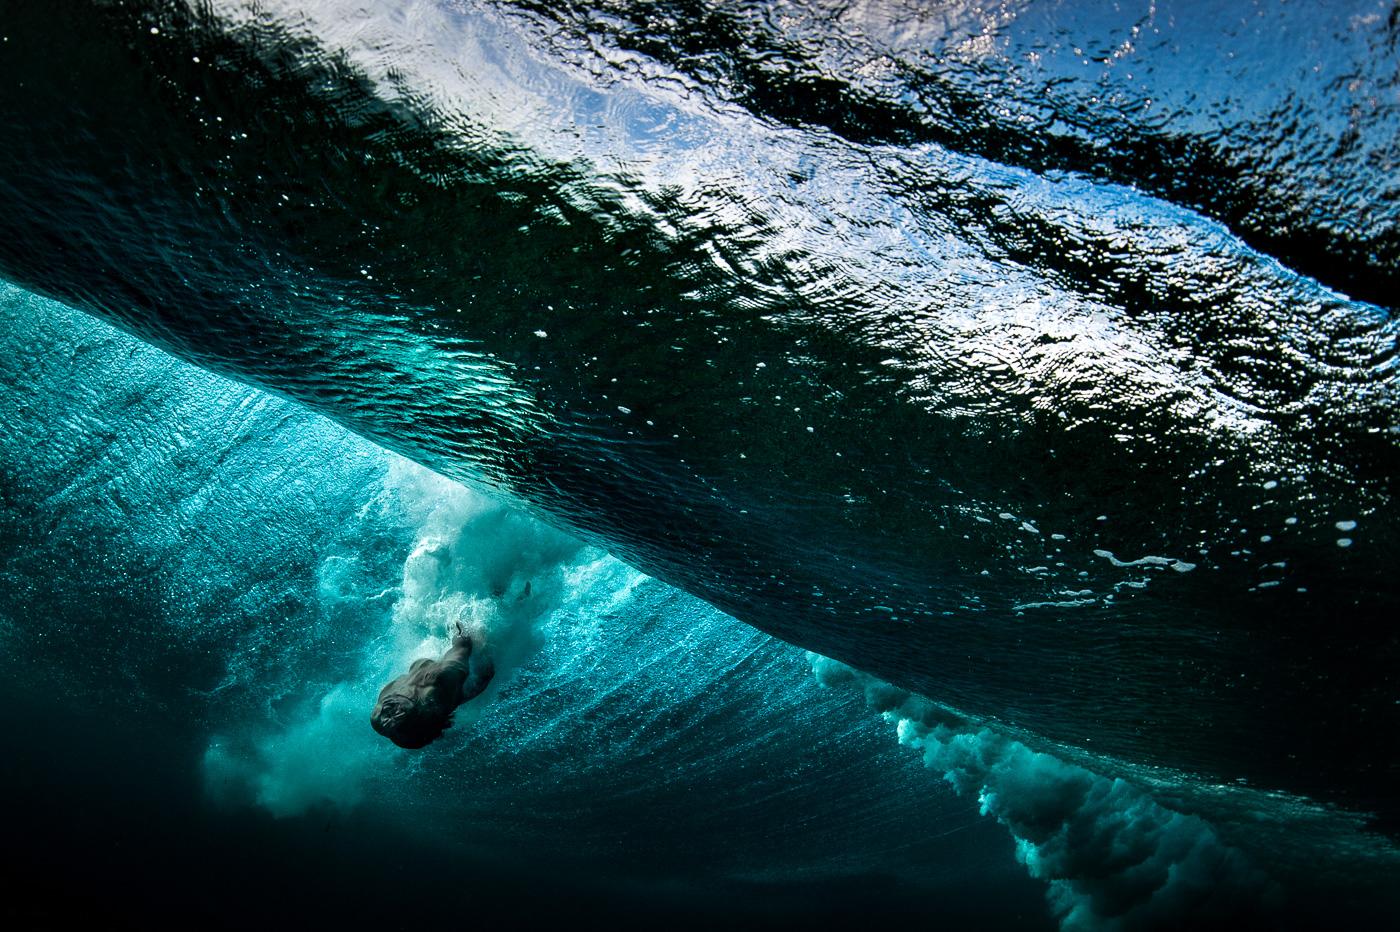 underwater heavy and big wave body surfing